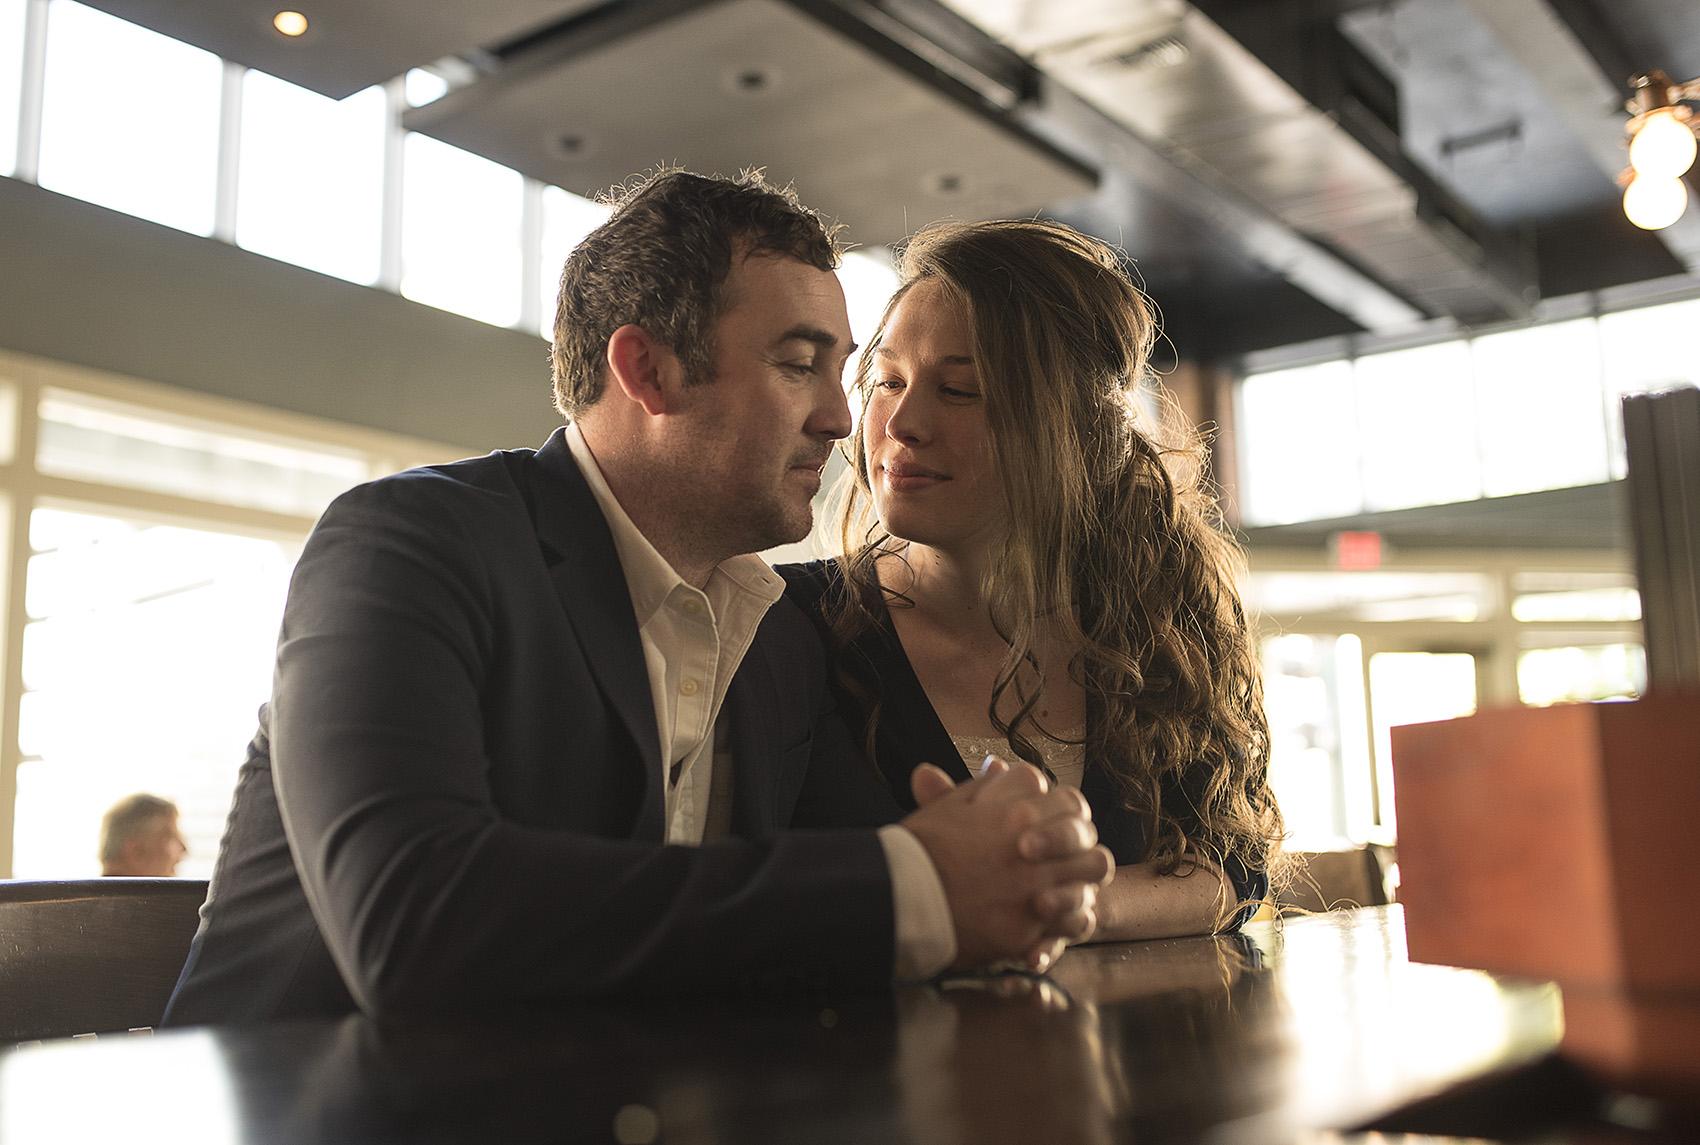 Houston honeymoon cafe classy intimate engagement Kate_Lawrence_038sm.jpg